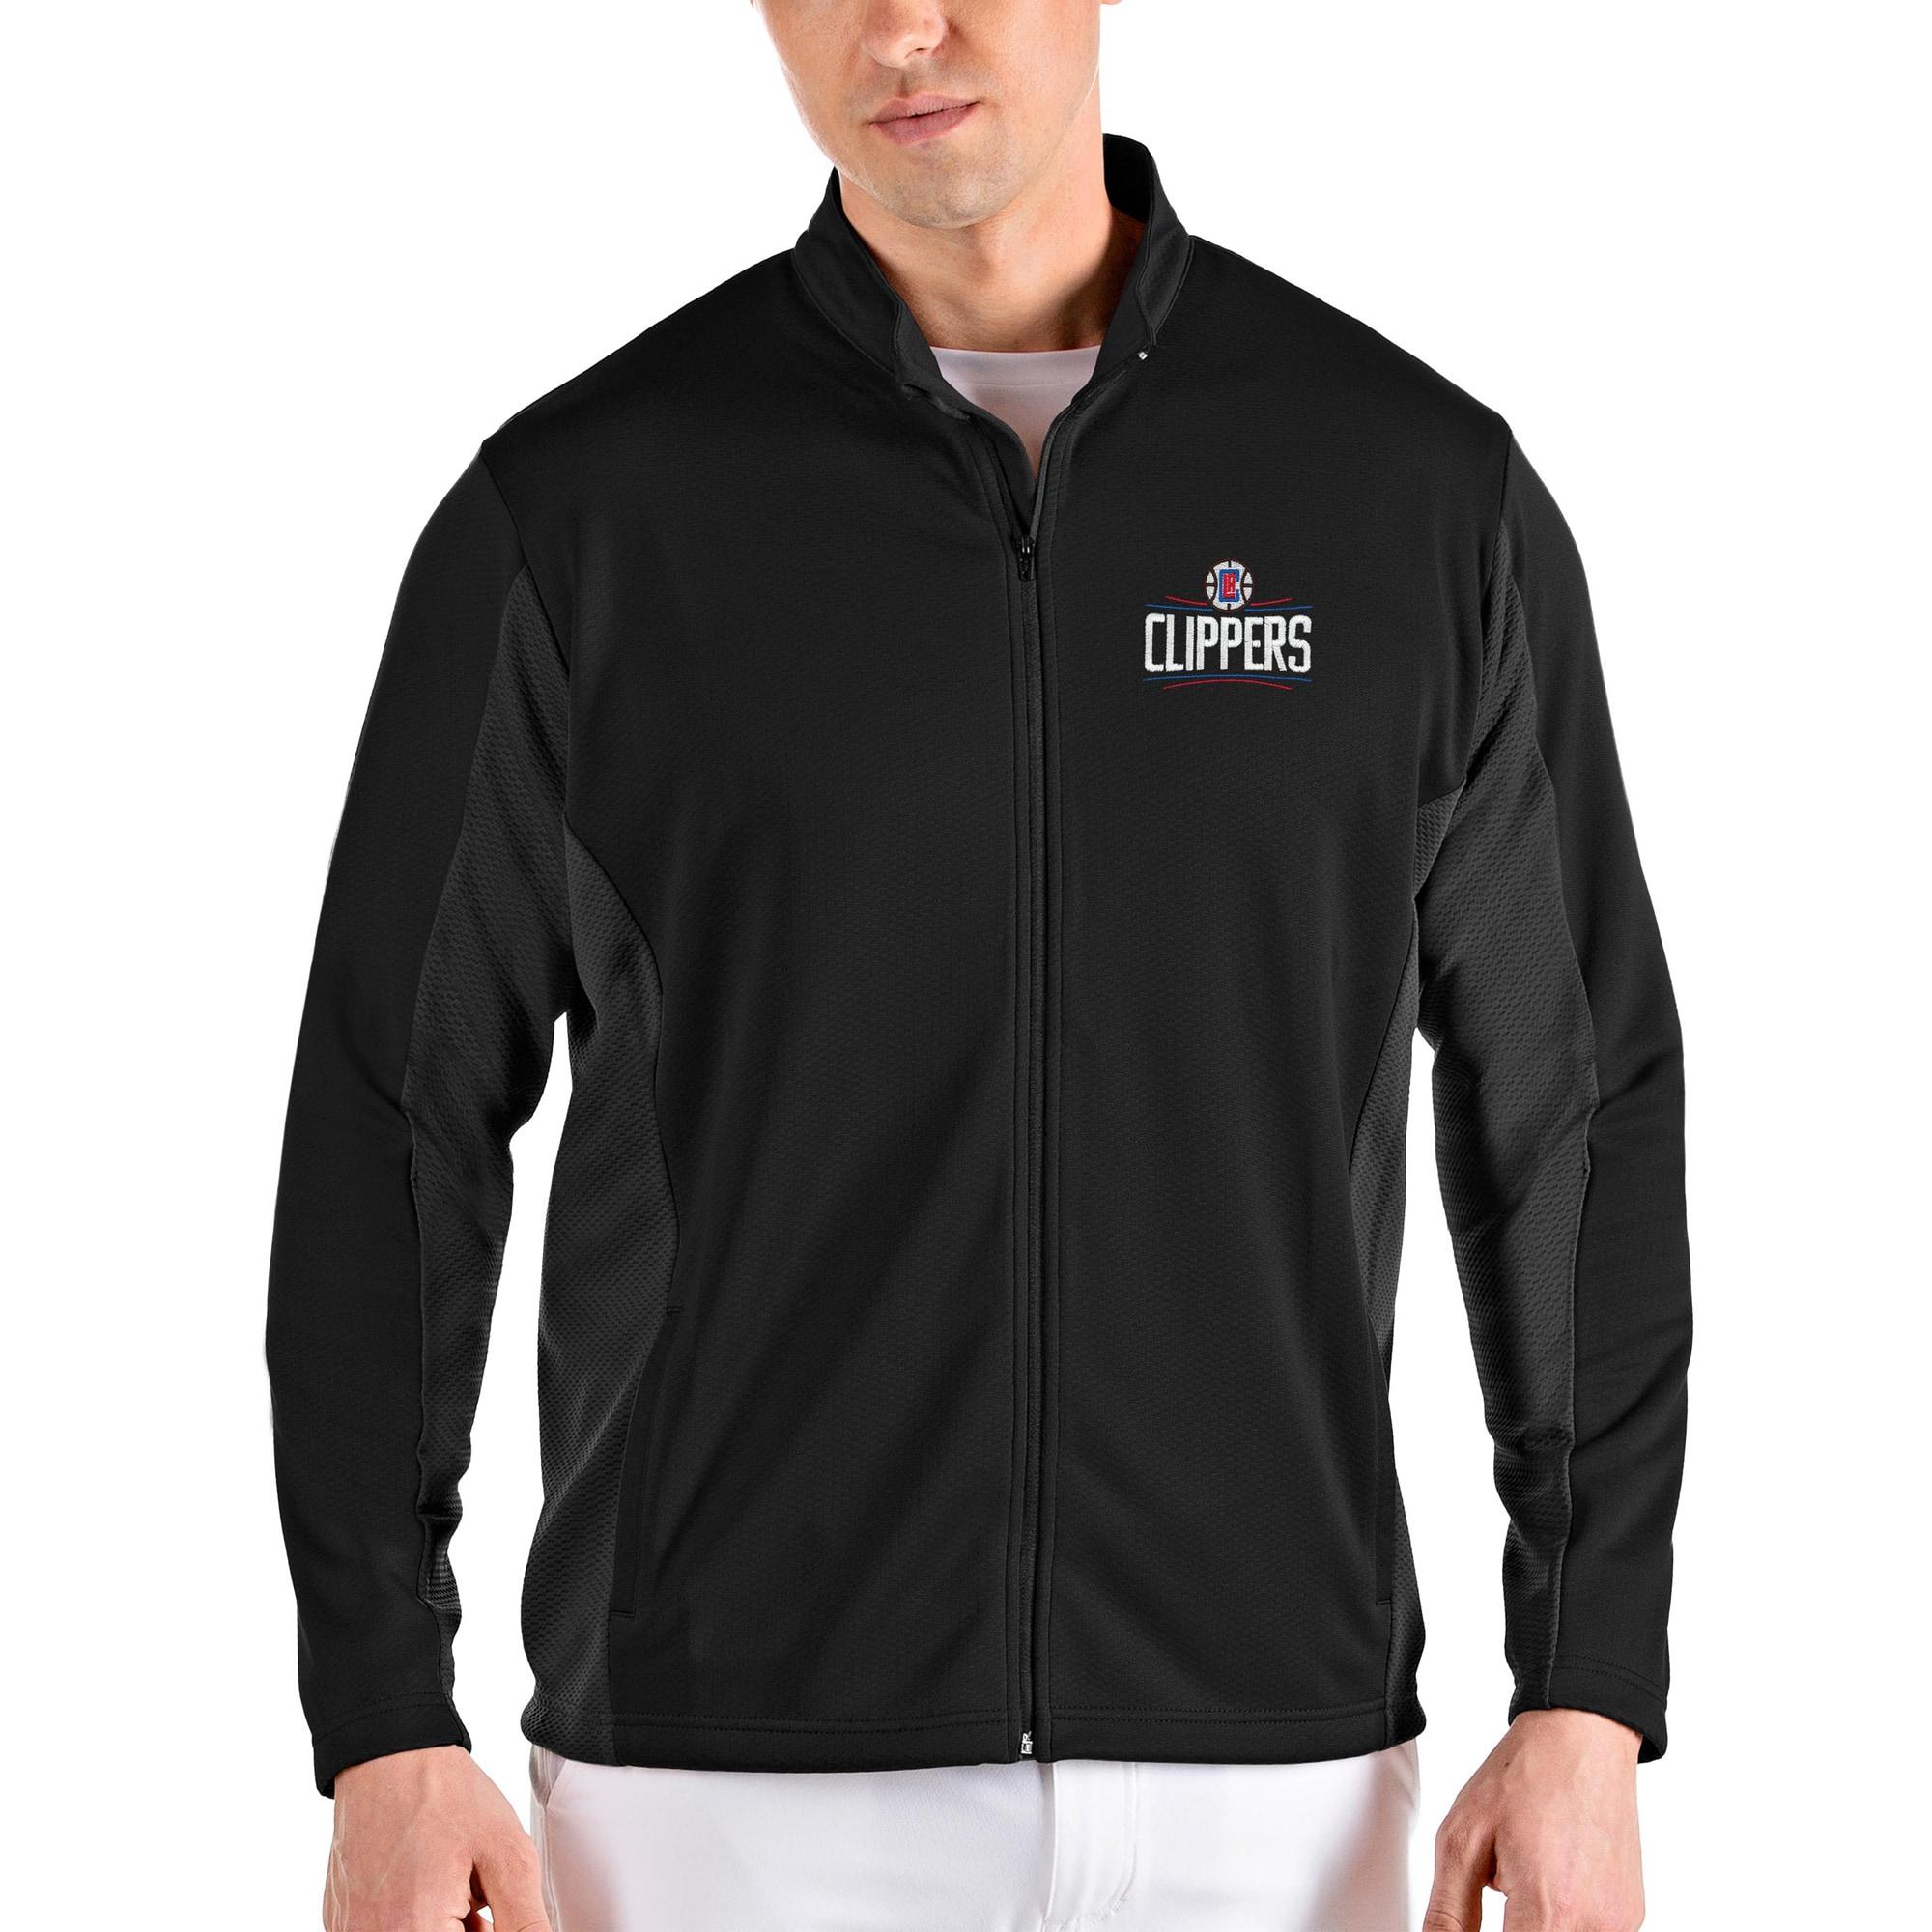 LA Clippers Antigua Passage Full-Zip Jacket - Black/Gray